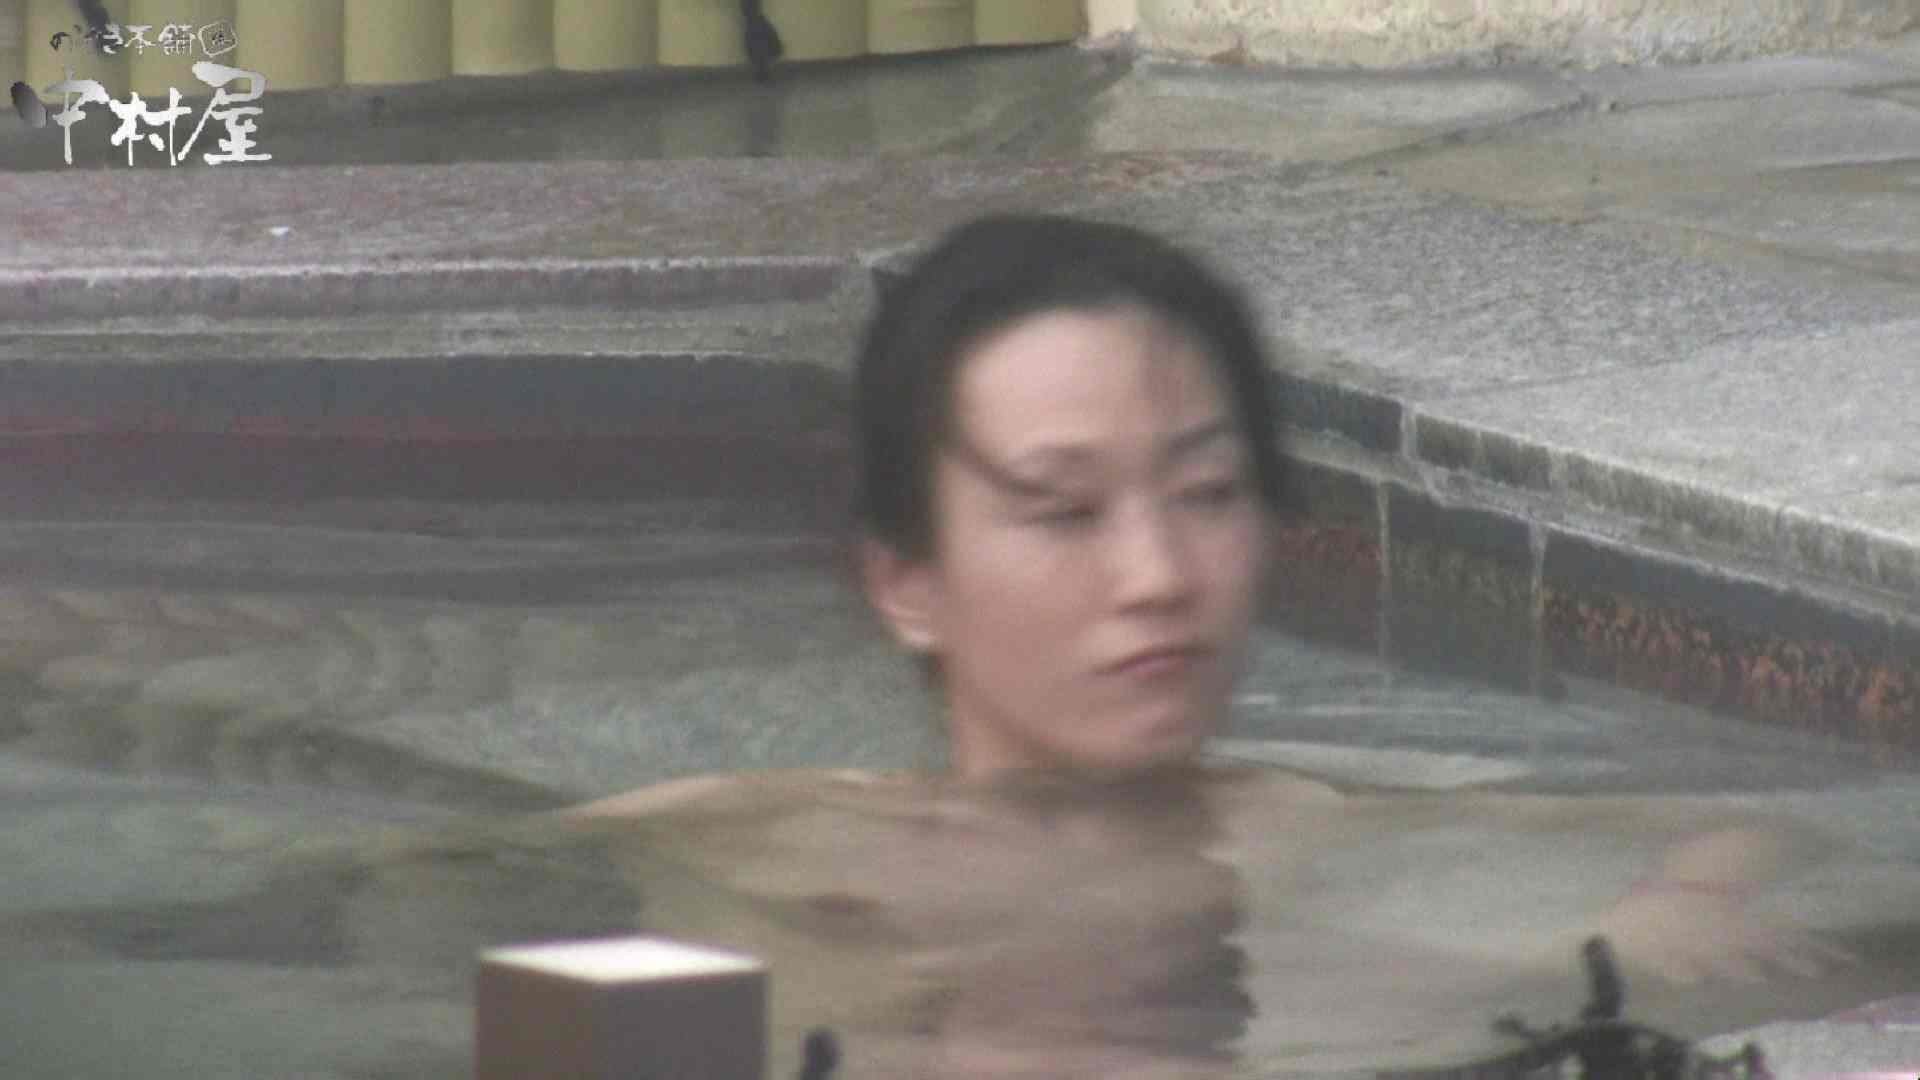 Aquaな露天風呂Vol.928 露天風呂突入 | 盗撮師作品  72pic 16